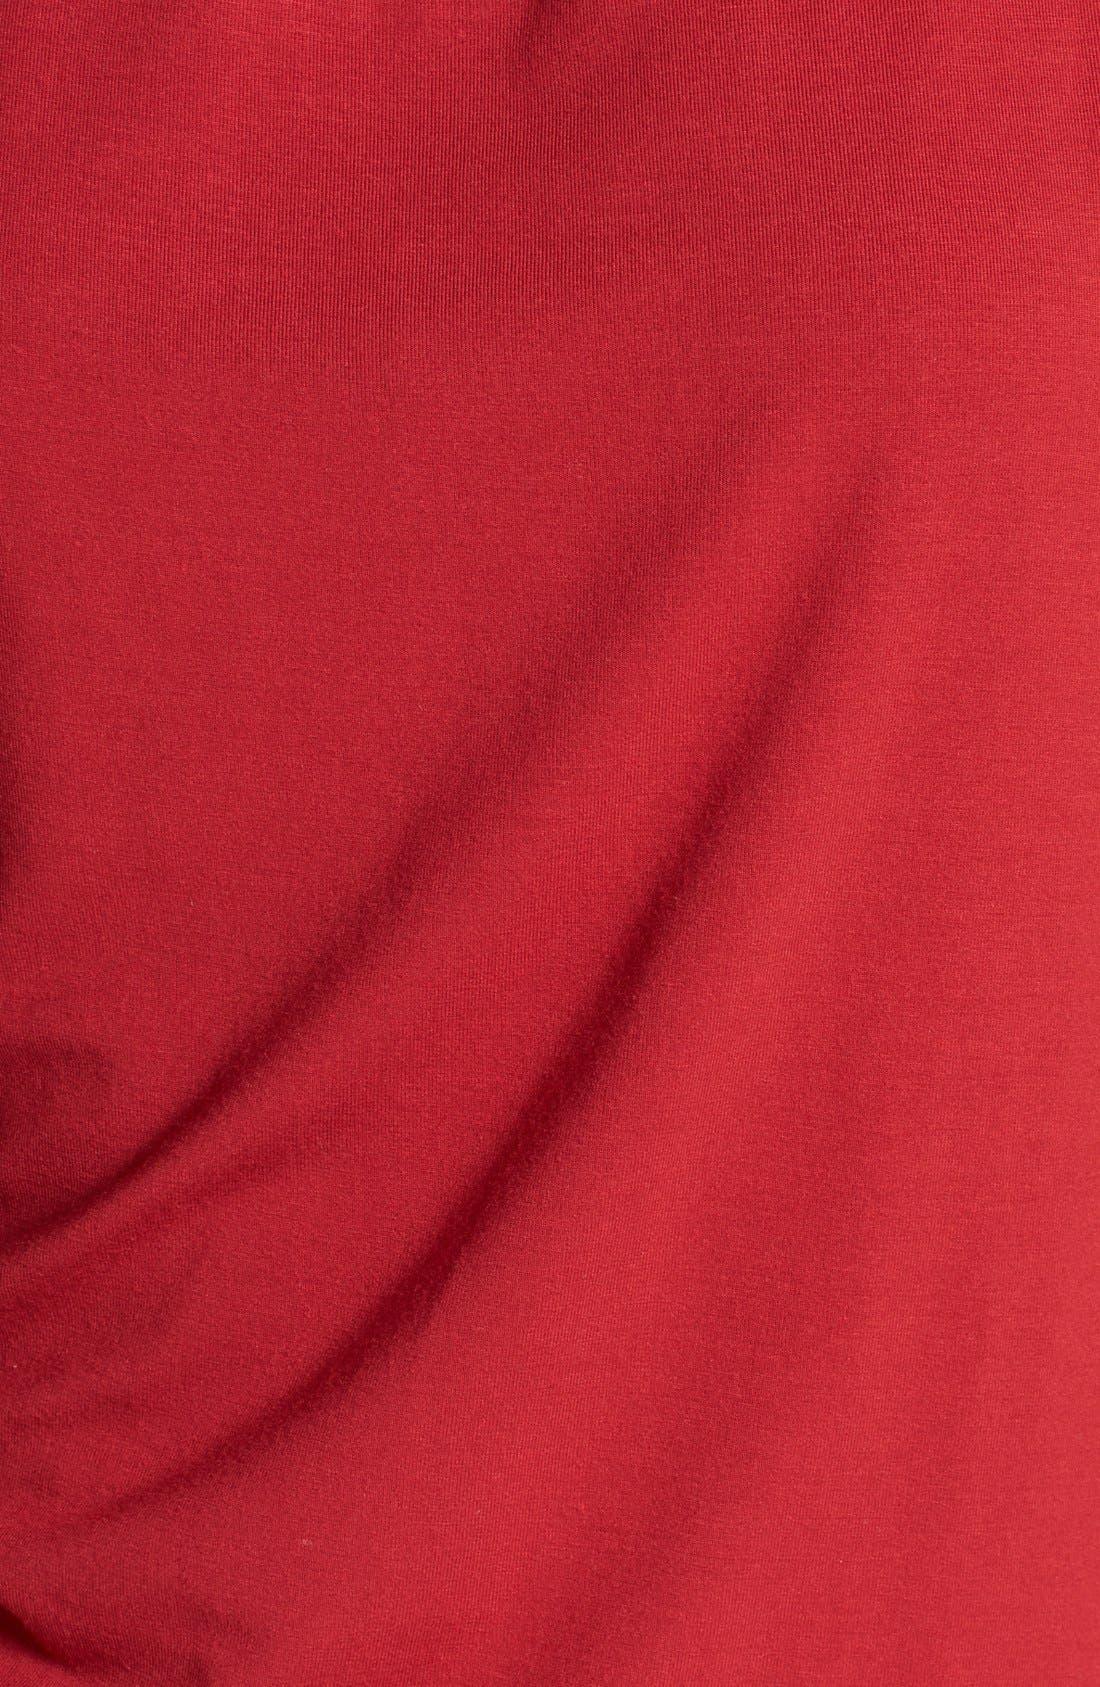 Alternate Image 3  - Bailey 44 'Unnecessary Roughness' Cutout Silk Yoke Top